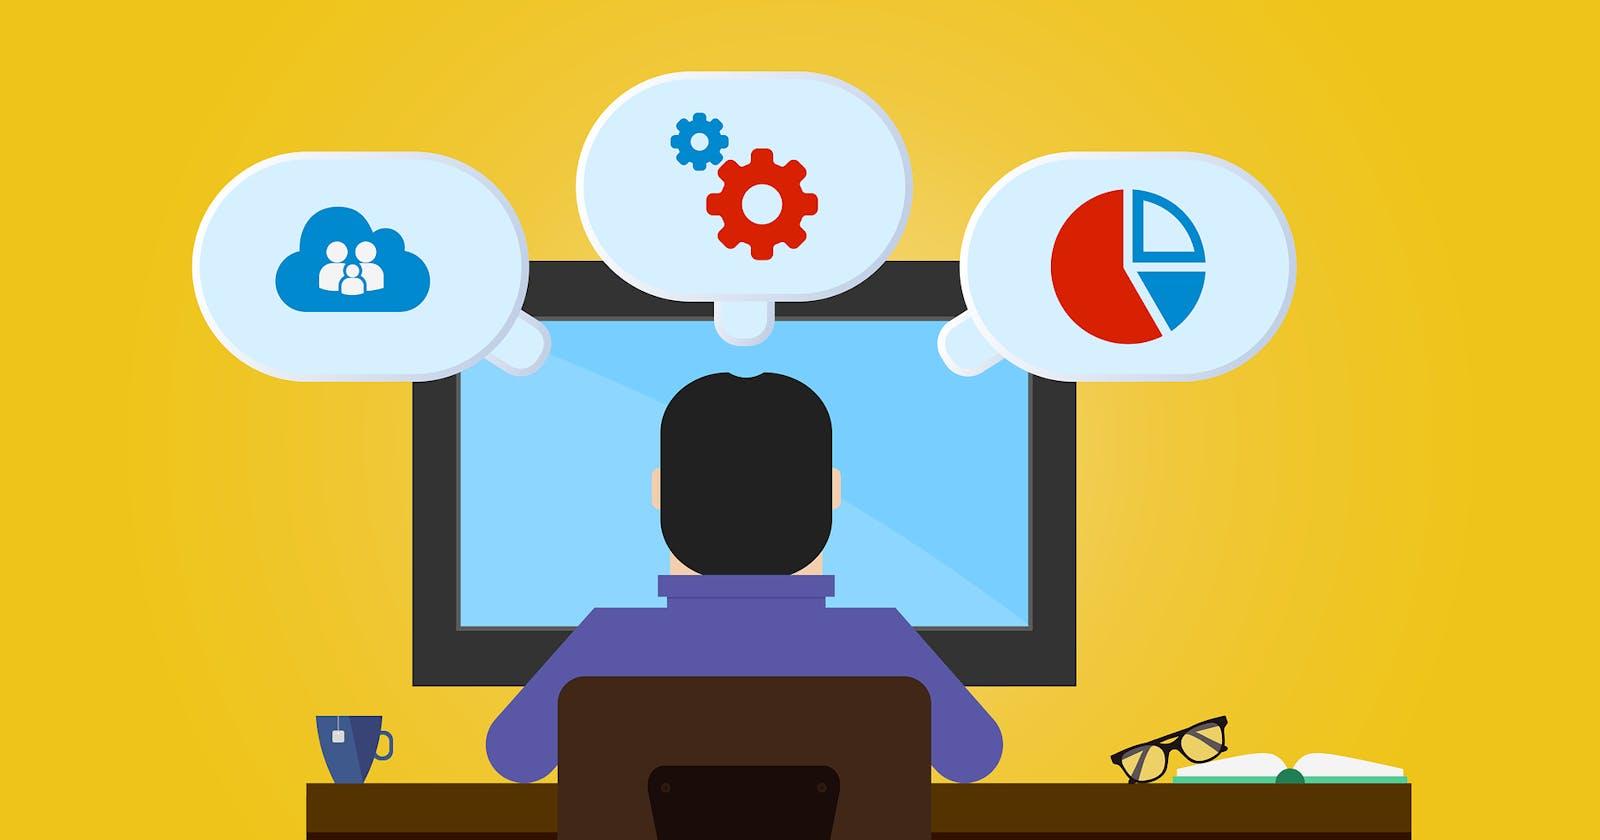 Top 10 Node.js Frameworks For Web Developers To Use in 2021